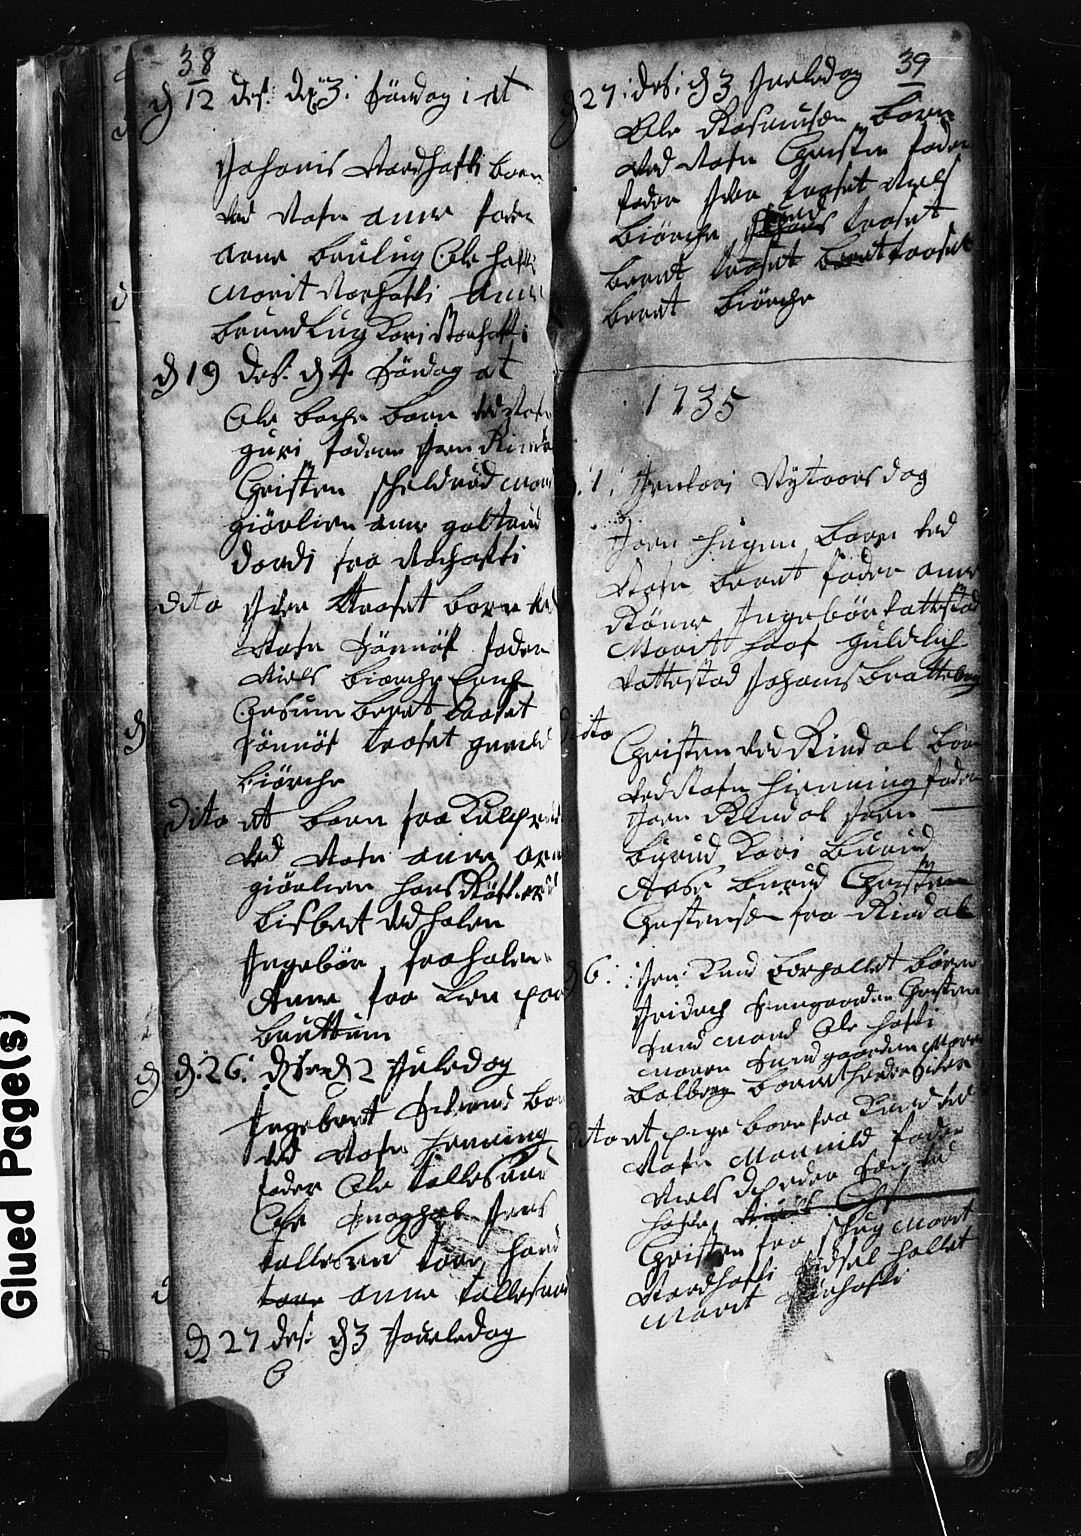 SAH, Fåberg prestekontor, Klokkerbok nr. 1, 1727-1767, s. 38-39